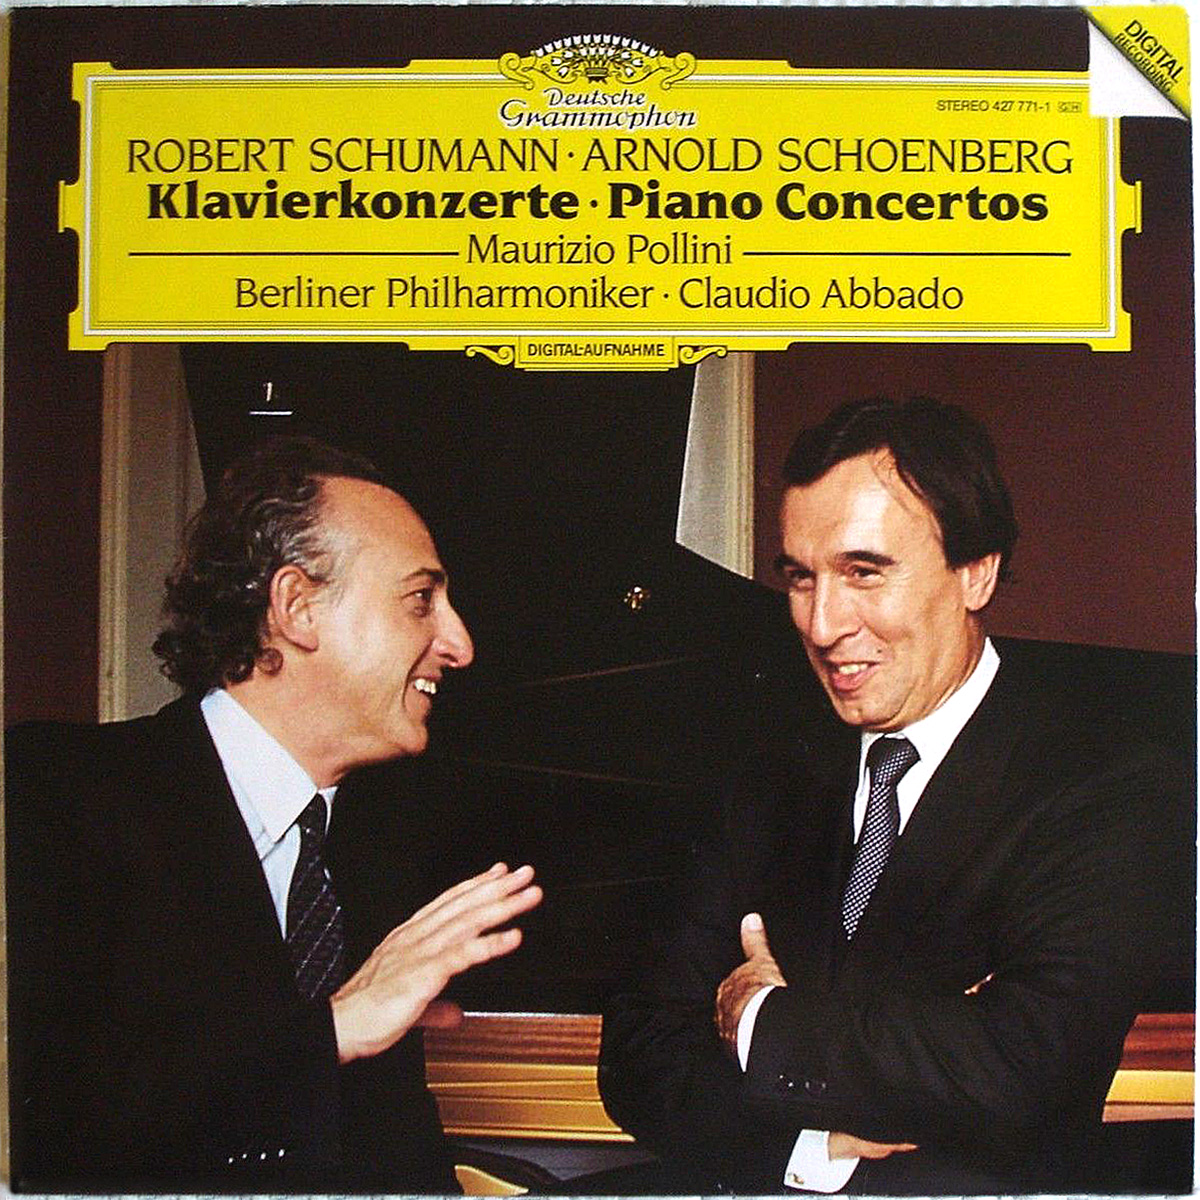 DGG 427 771 Schumann_Schoenberg_Concerto Piano Pollini Abbado DGG Digital Aufnahme